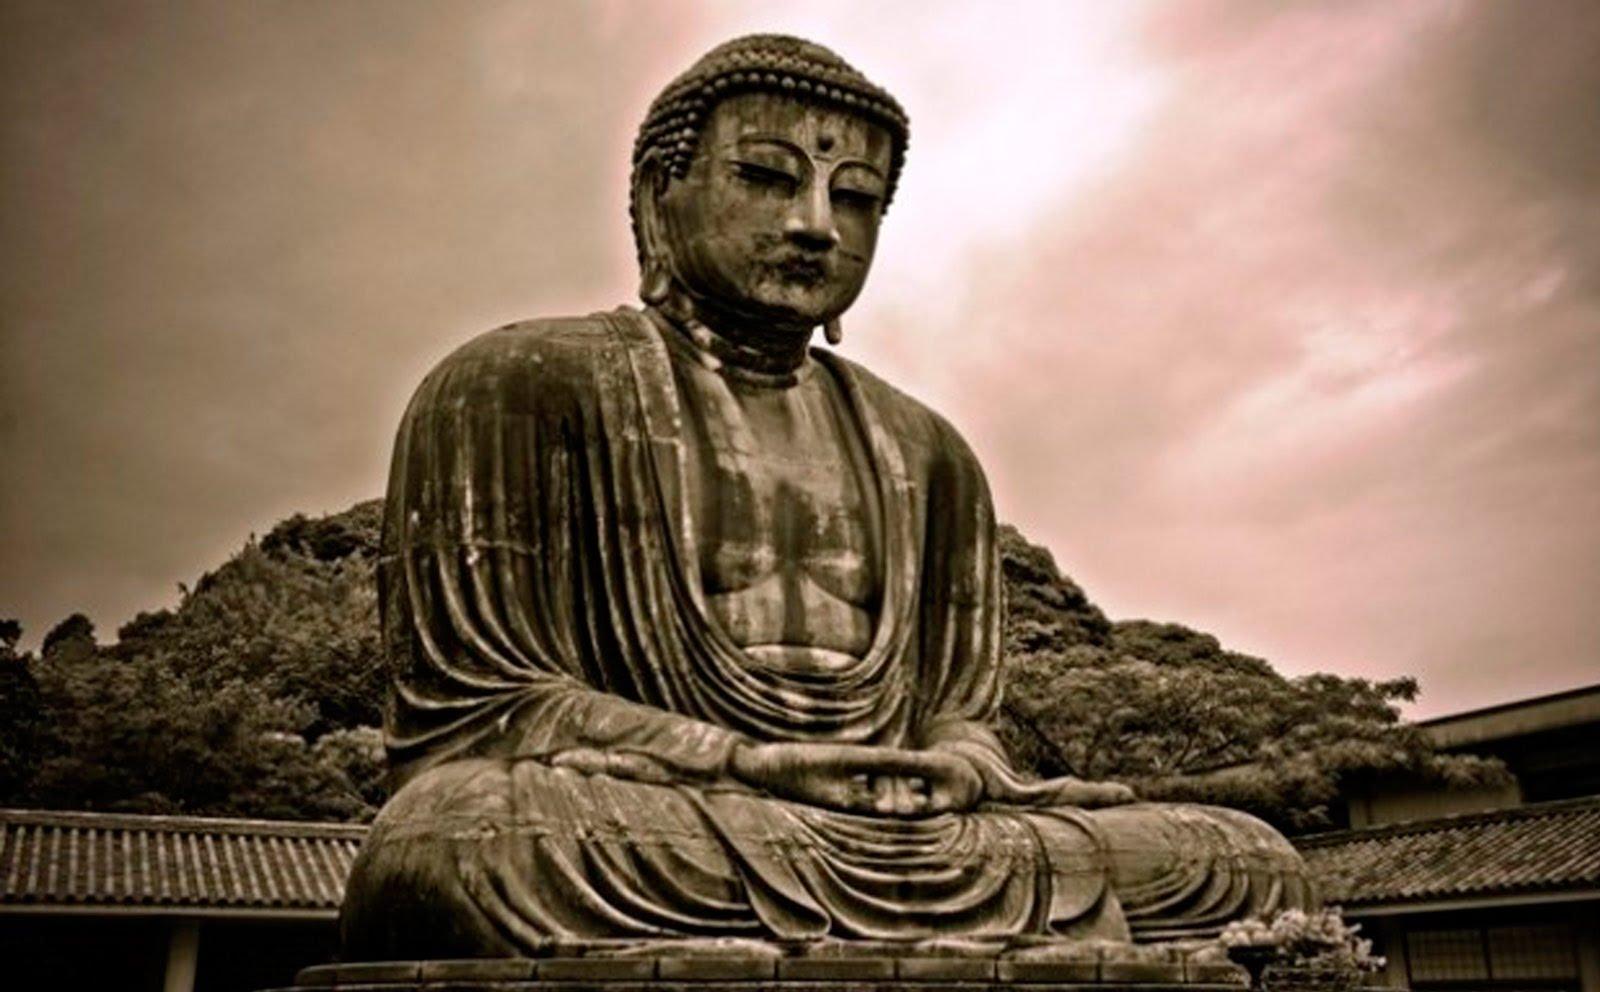 Historia de Buda